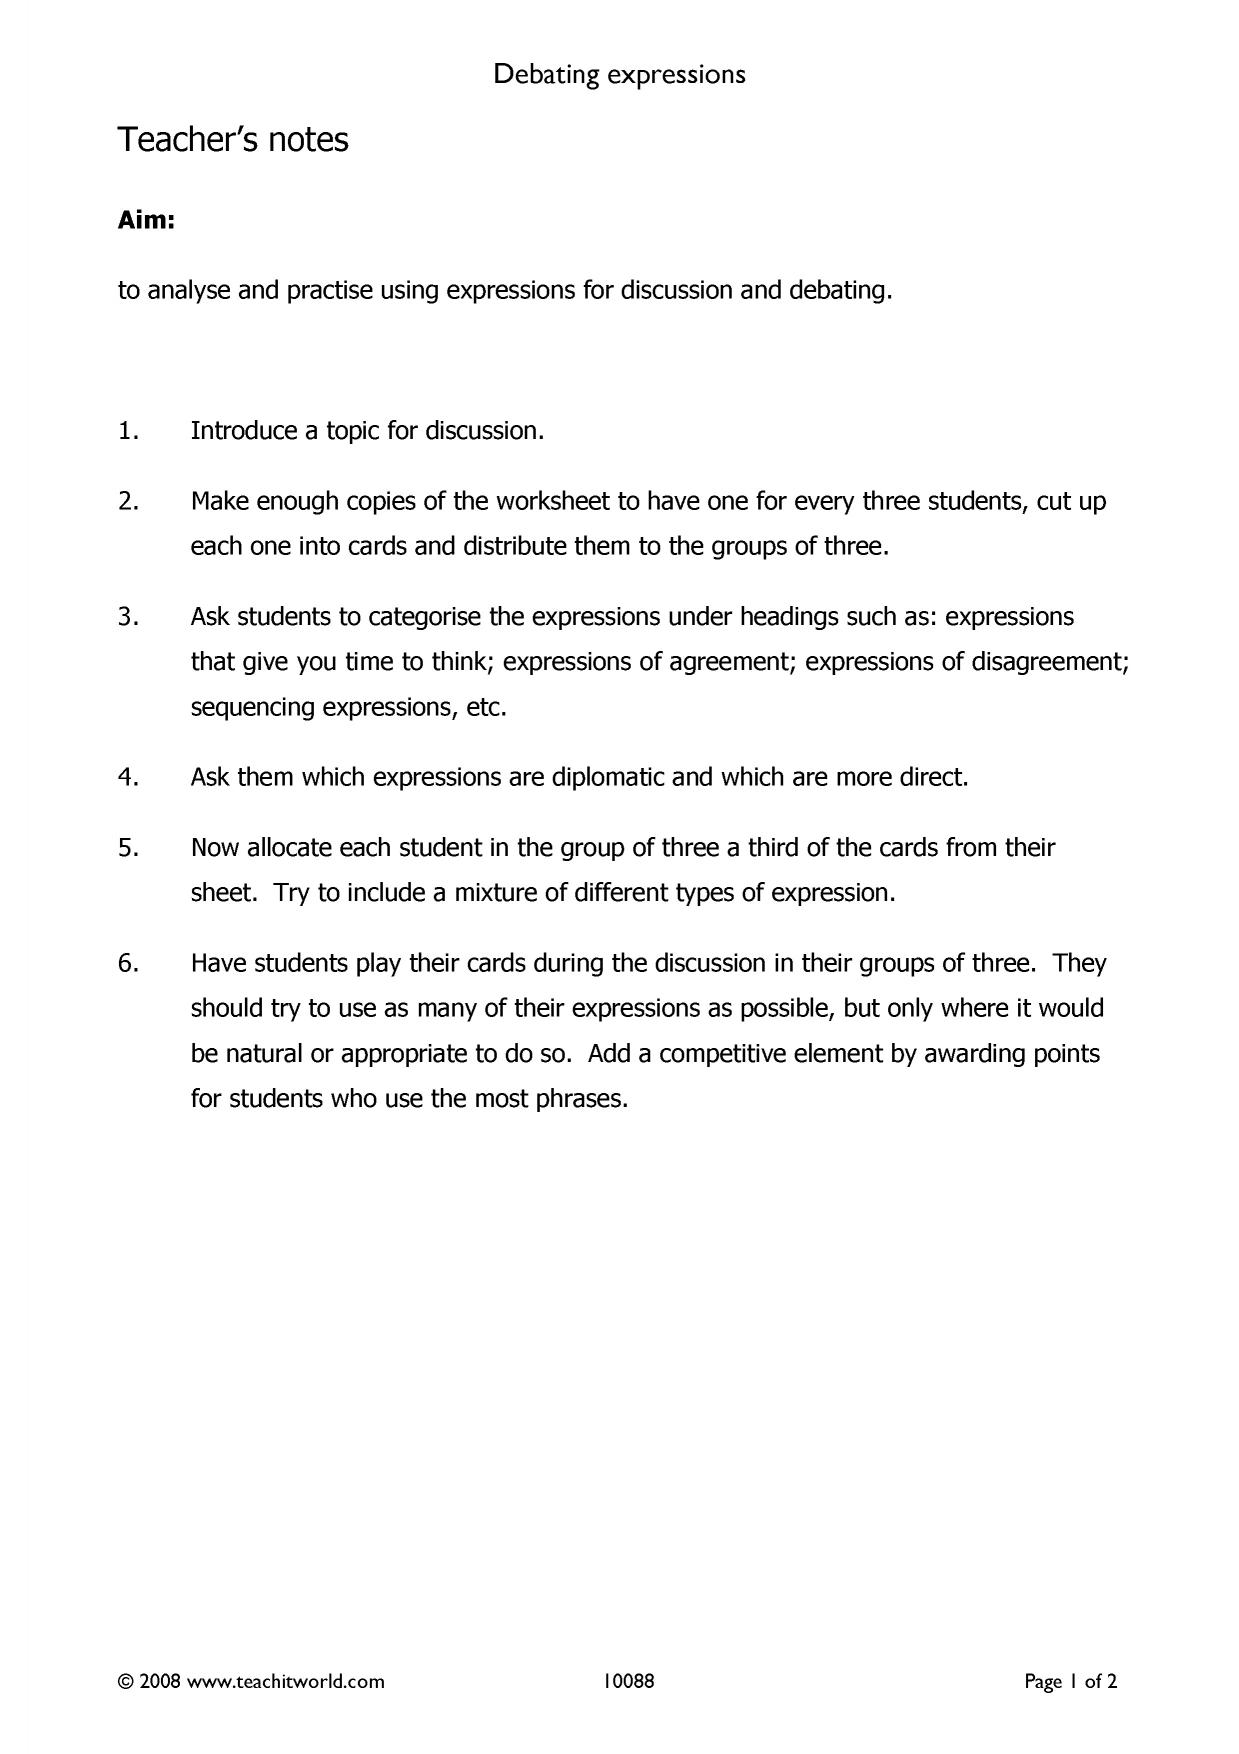 Exam resources | IELTS | Teachit Languages